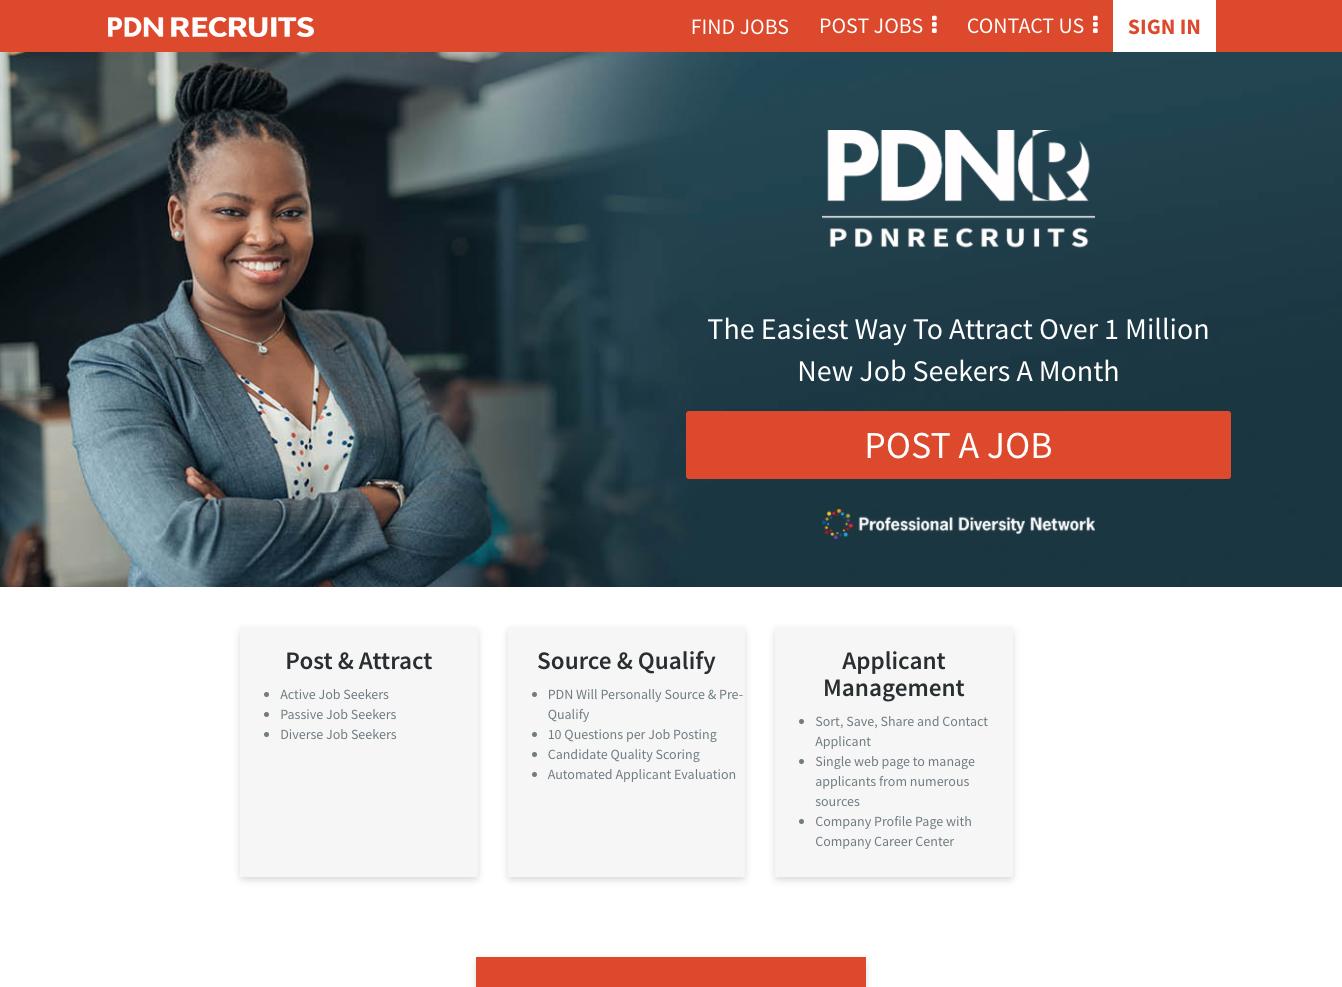 PDN Recruits